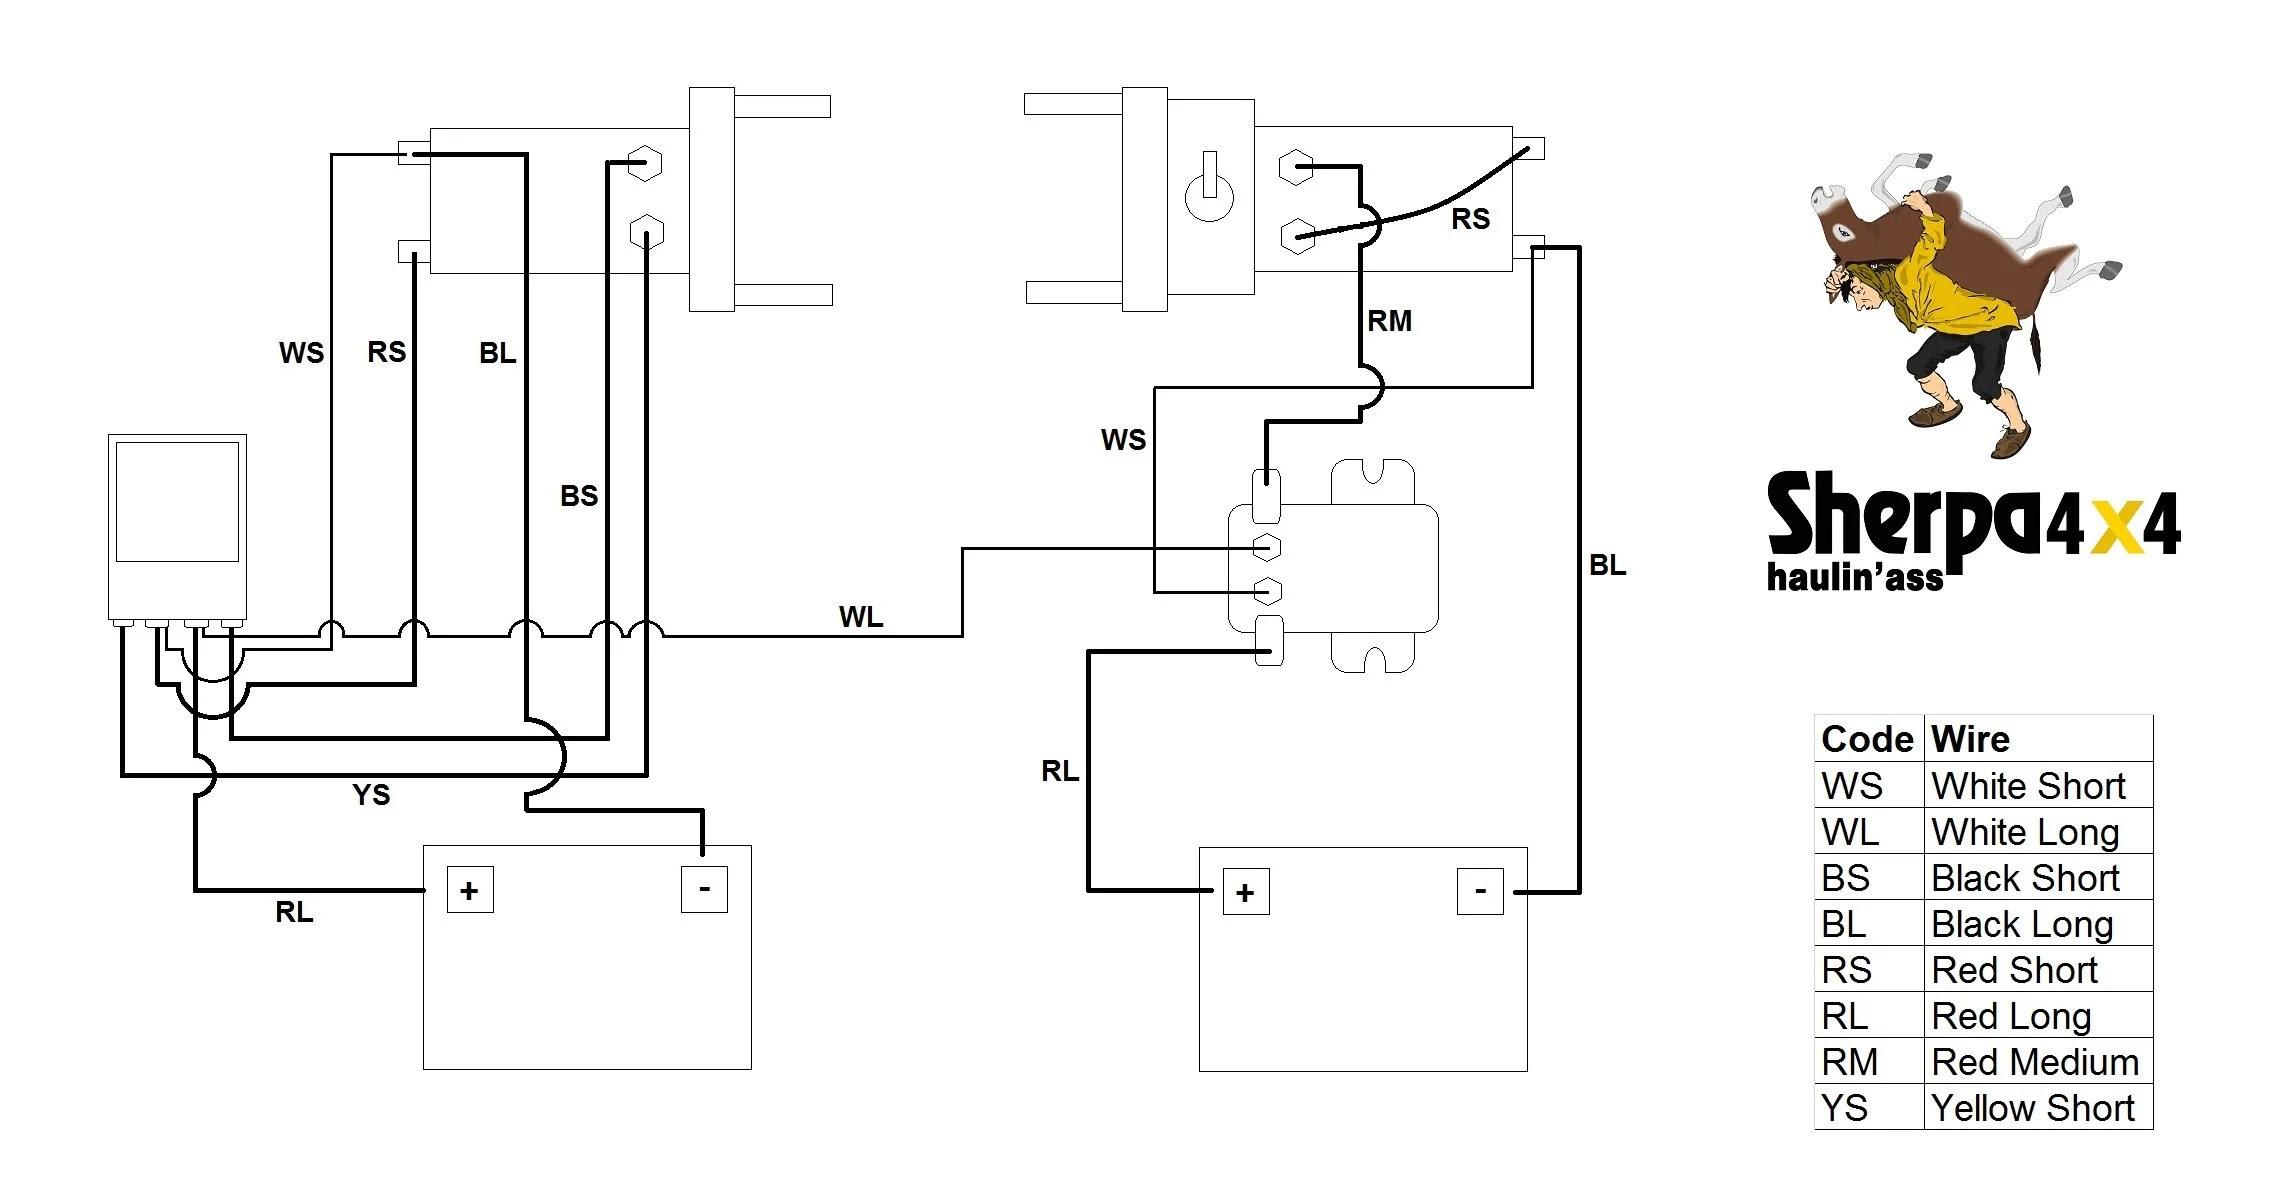 98 Buick Park Avenue Wiper Motor Wiring Diagram - Wiring ...